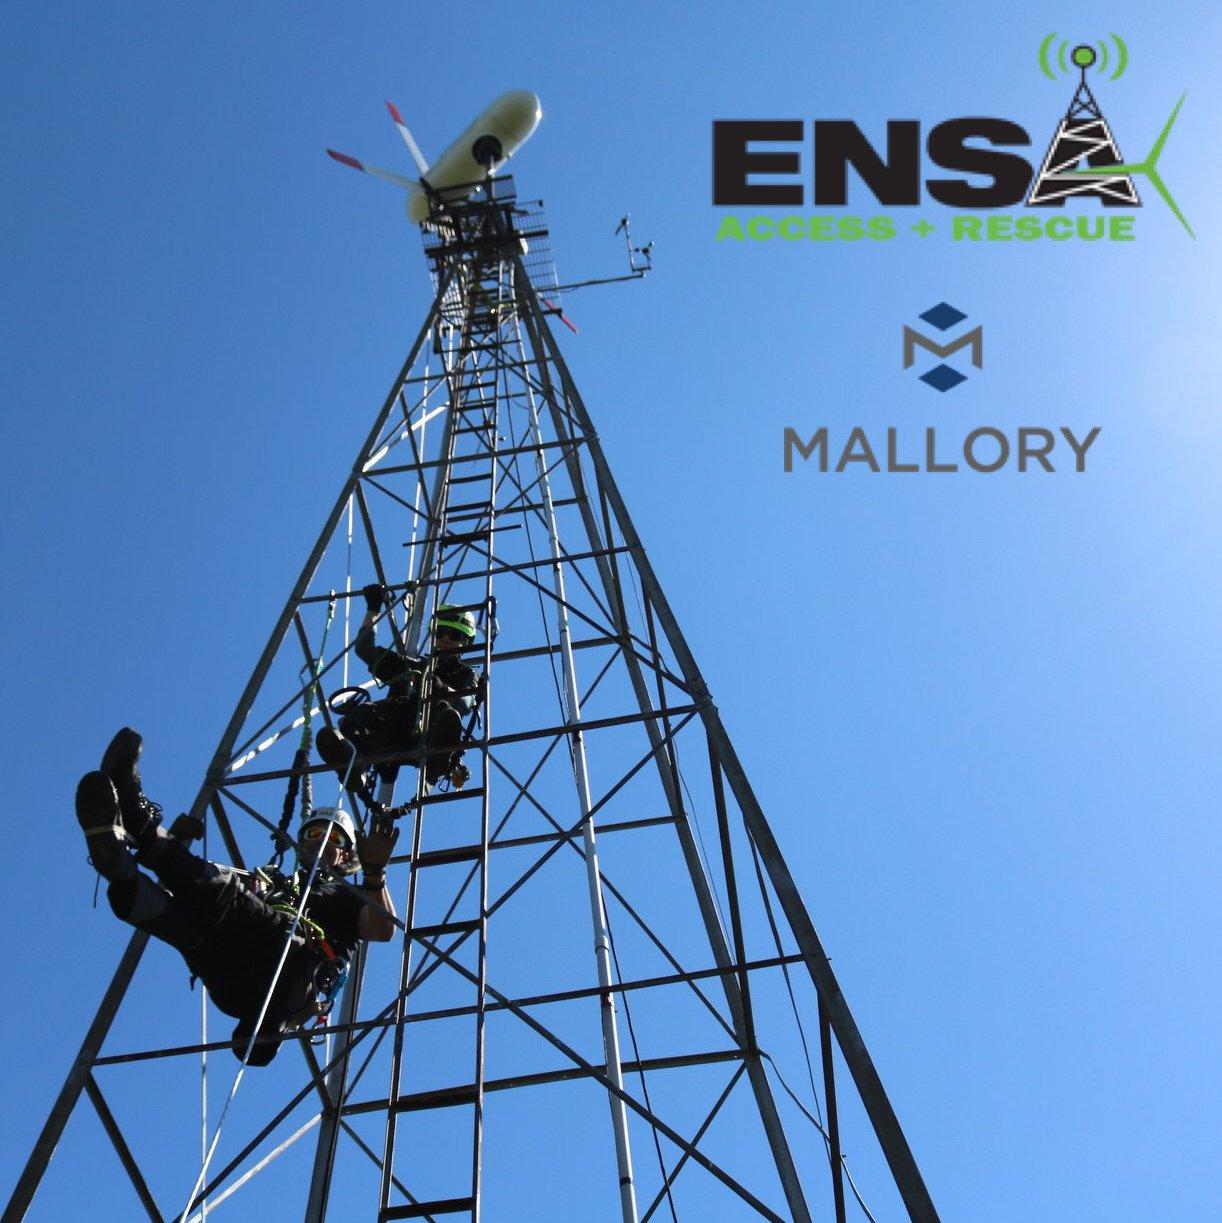 Petzl Technical Partner - ENSA